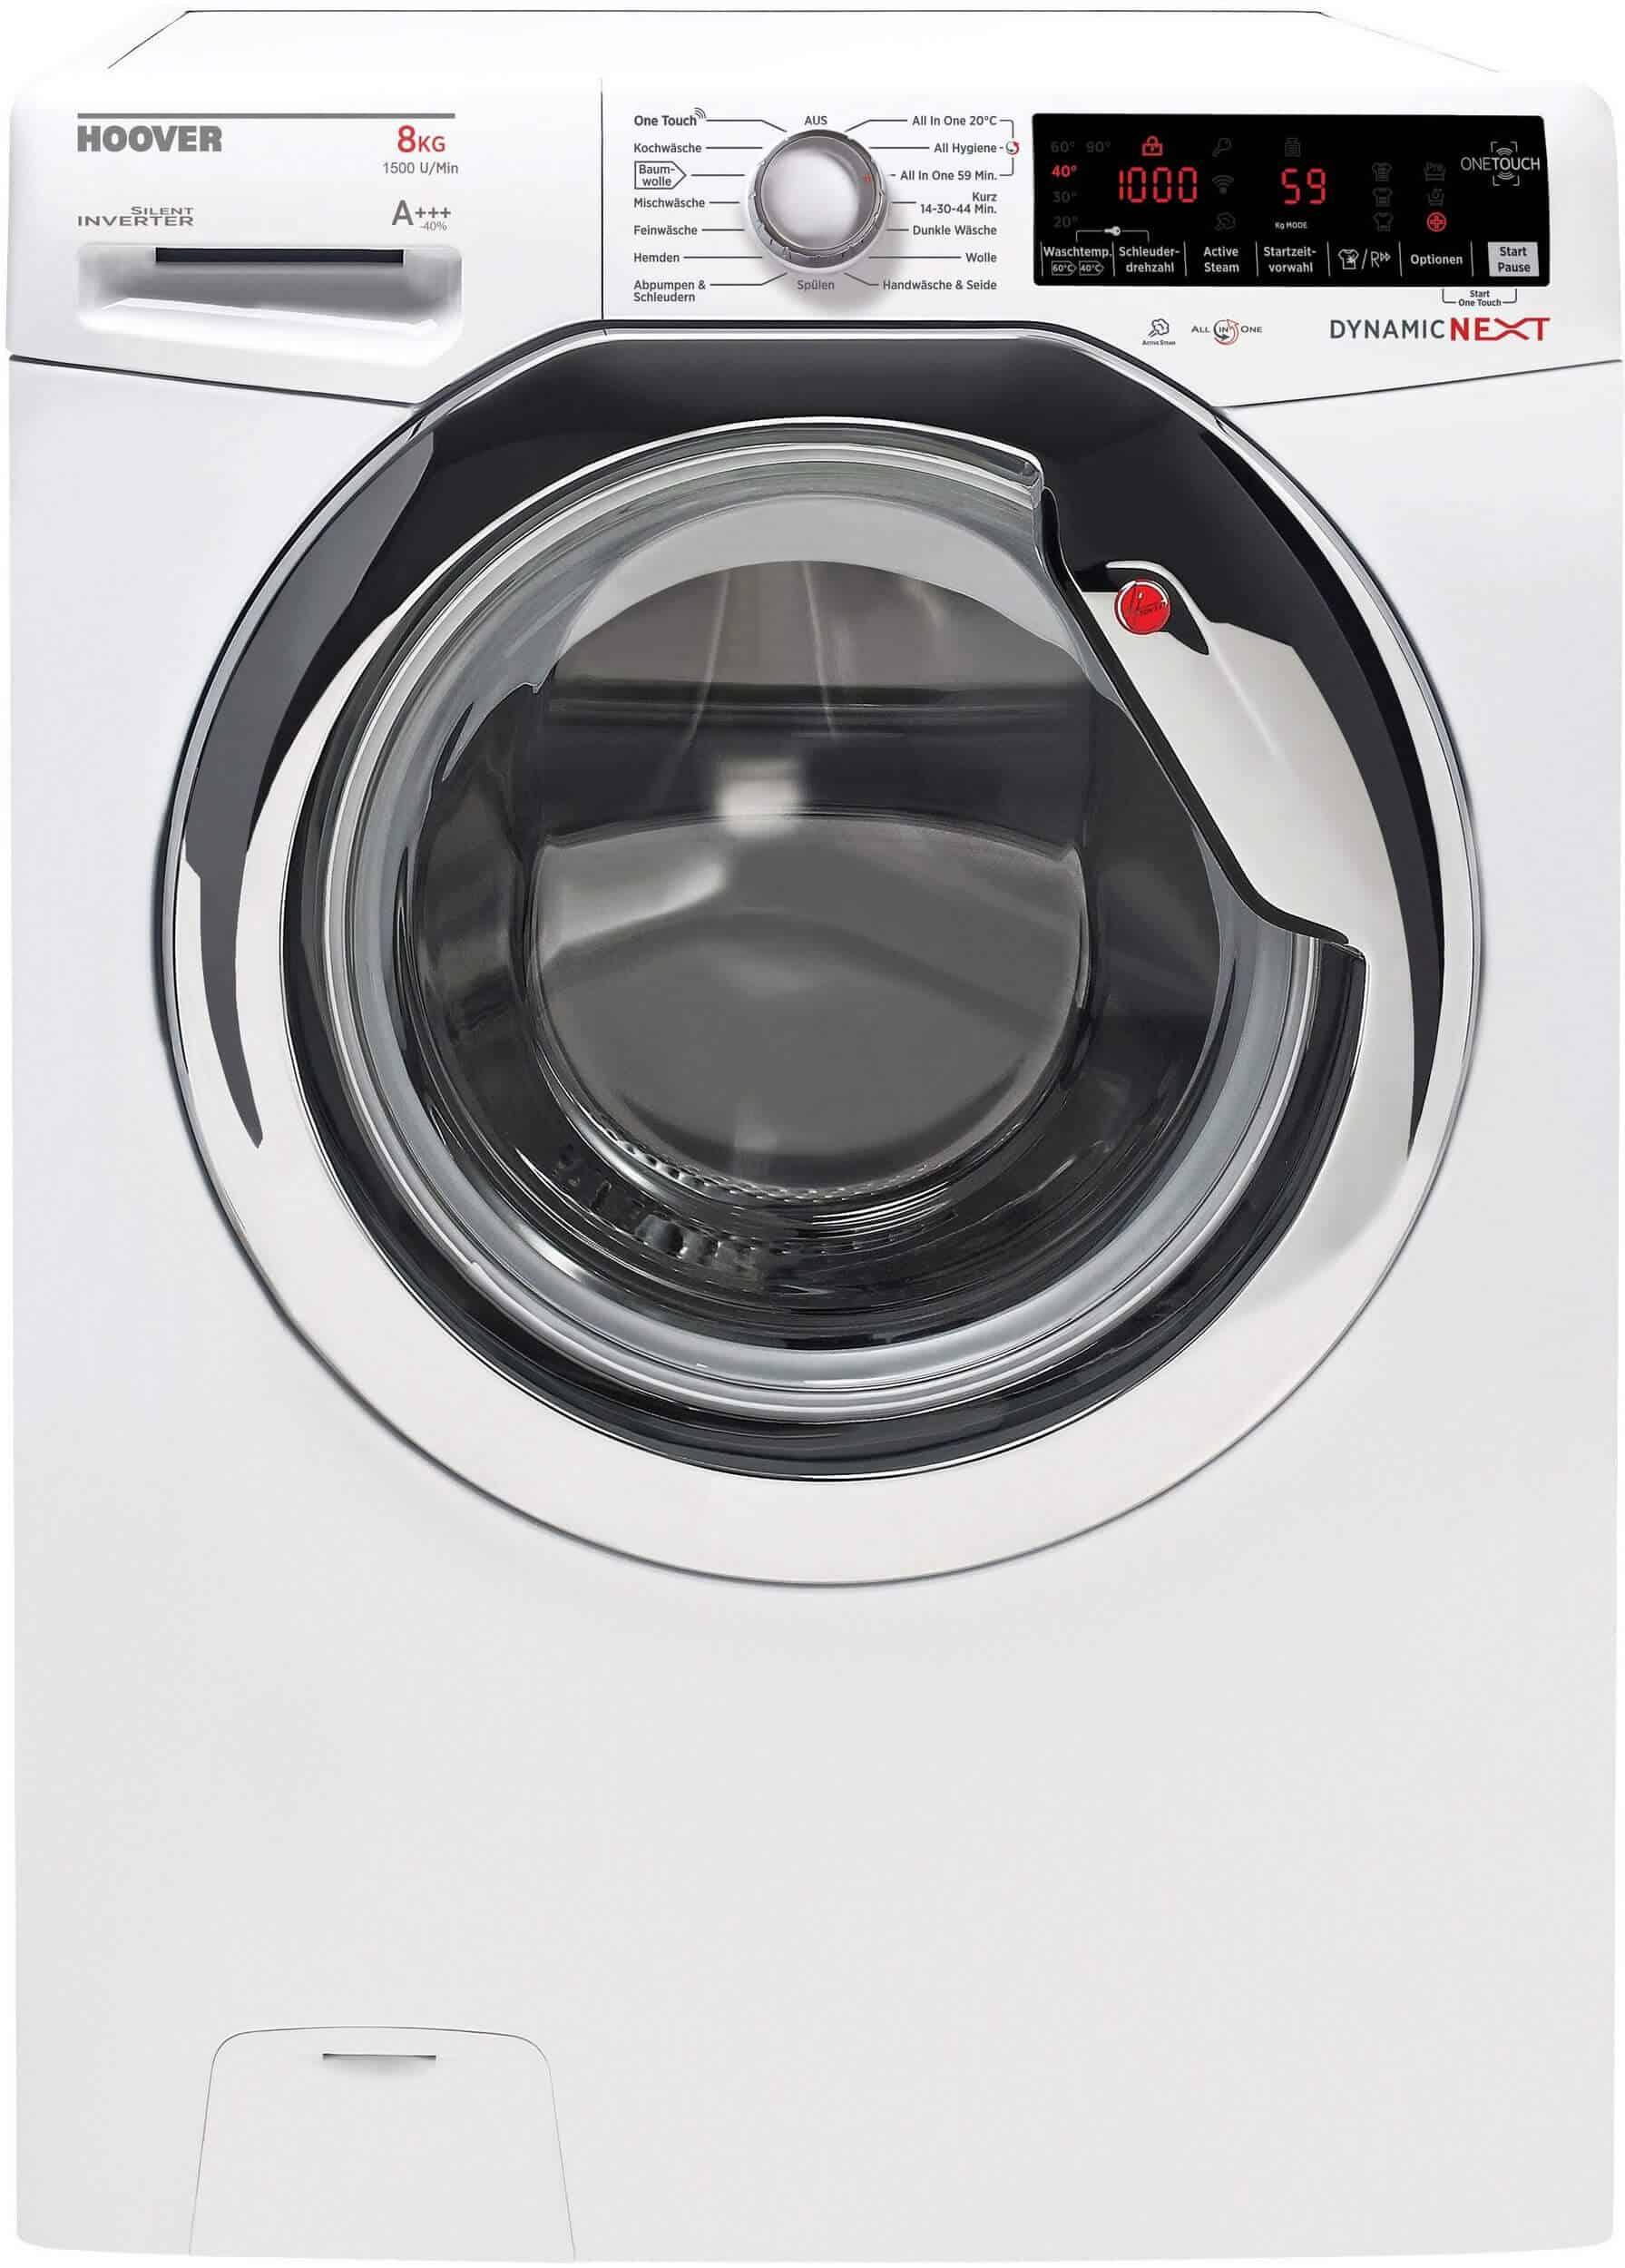 hoover dxoa g58ahc3 84 waschmaschine im test 2018. Black Bedroom Furniture Sets. Home Design Ideas